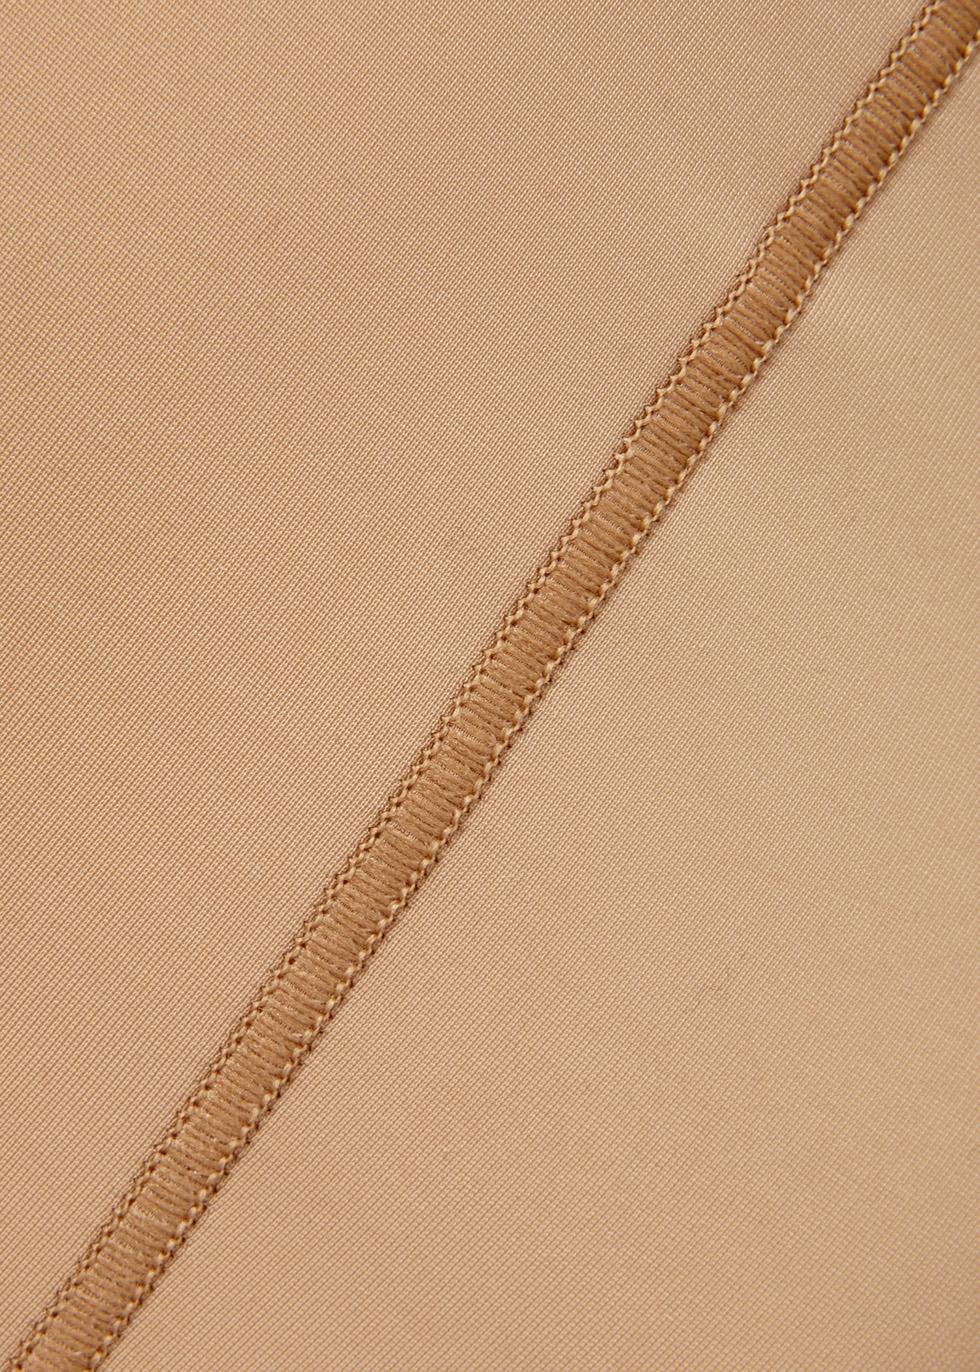 Beauty Secret control shorts - Wacoal